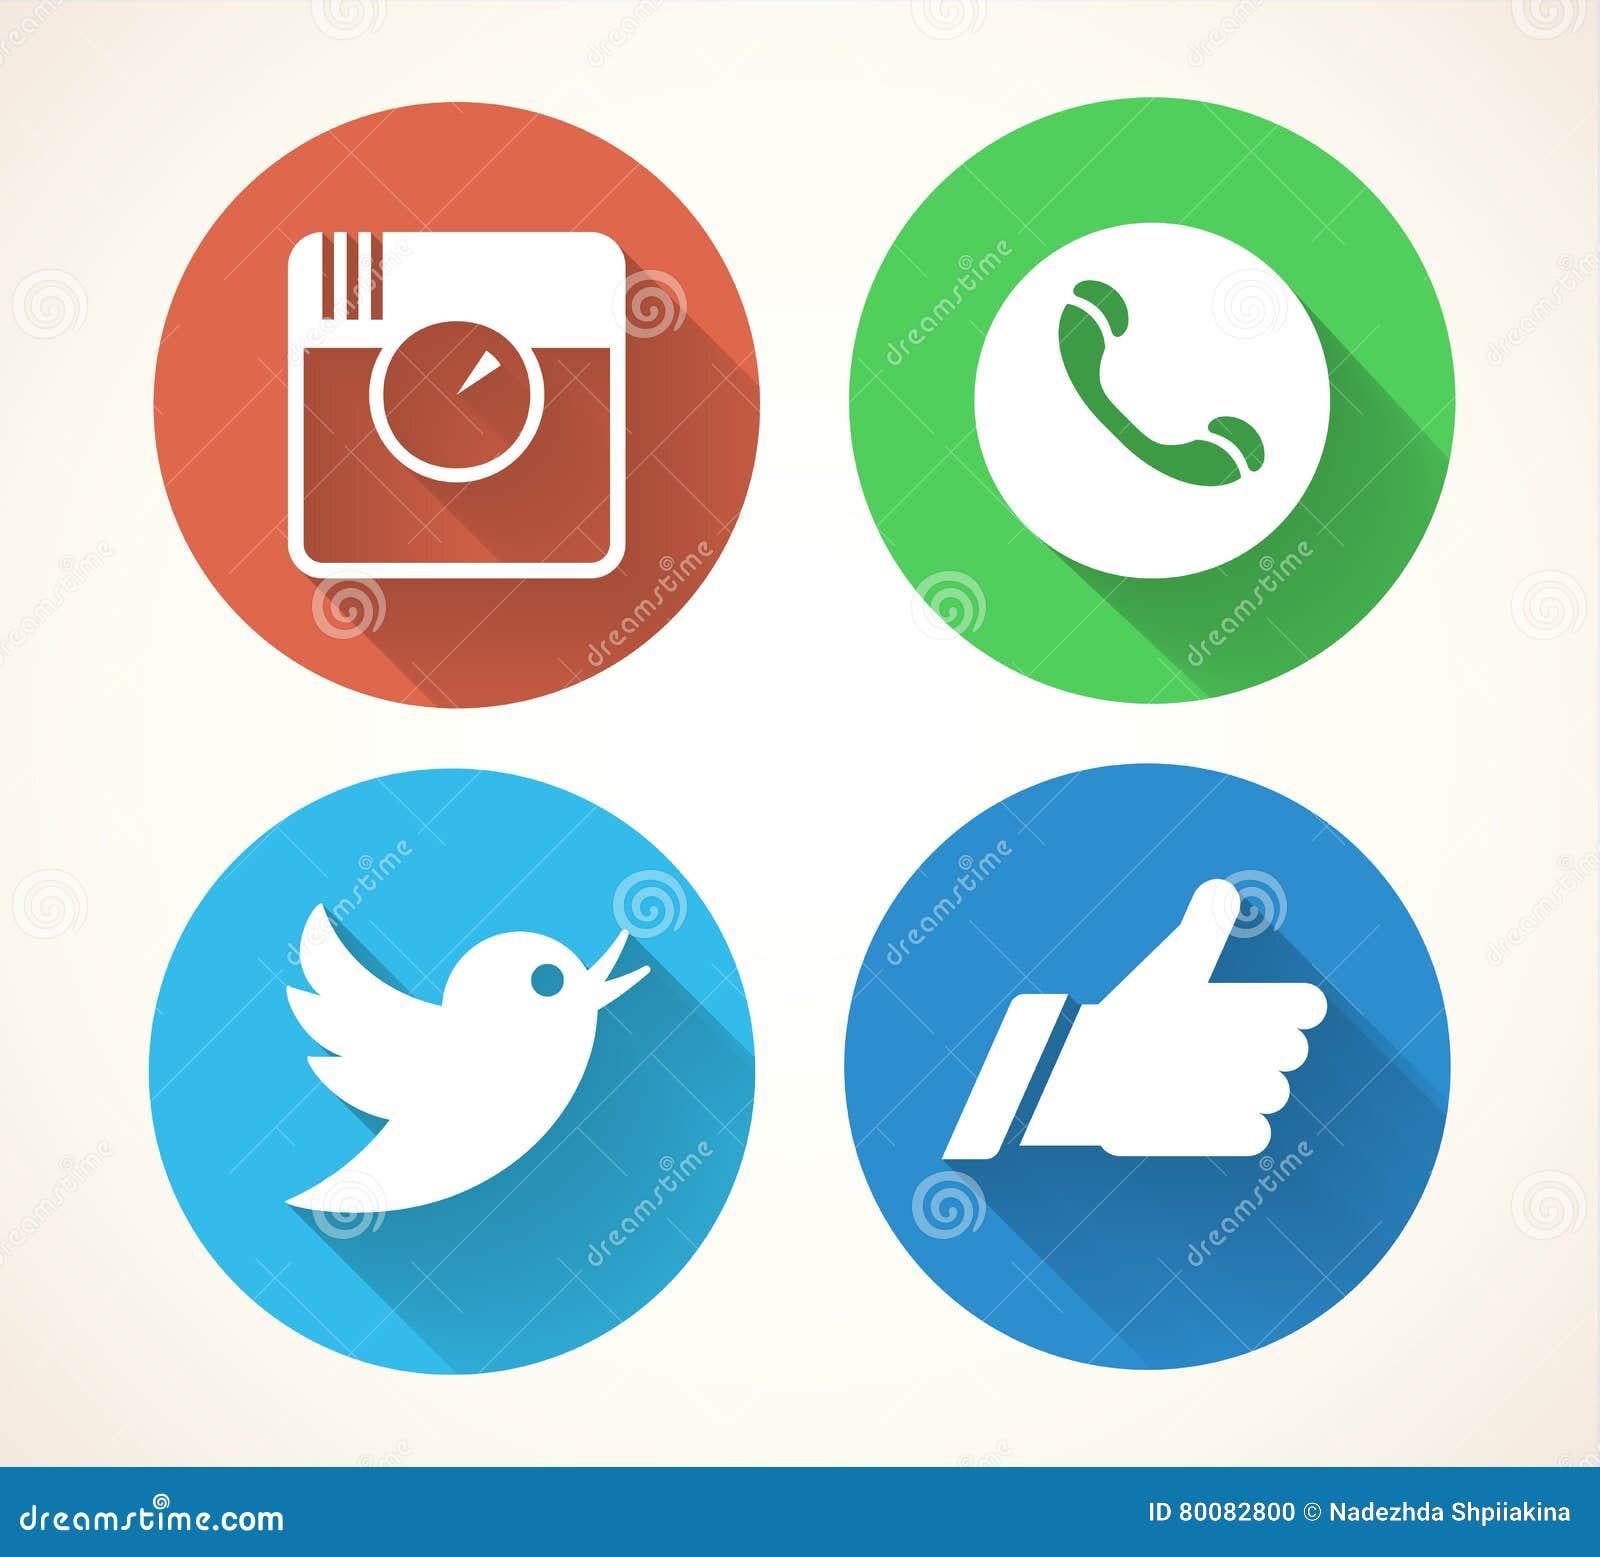 Social Media Icons Set Colorfull Network Symbols Isolated On White